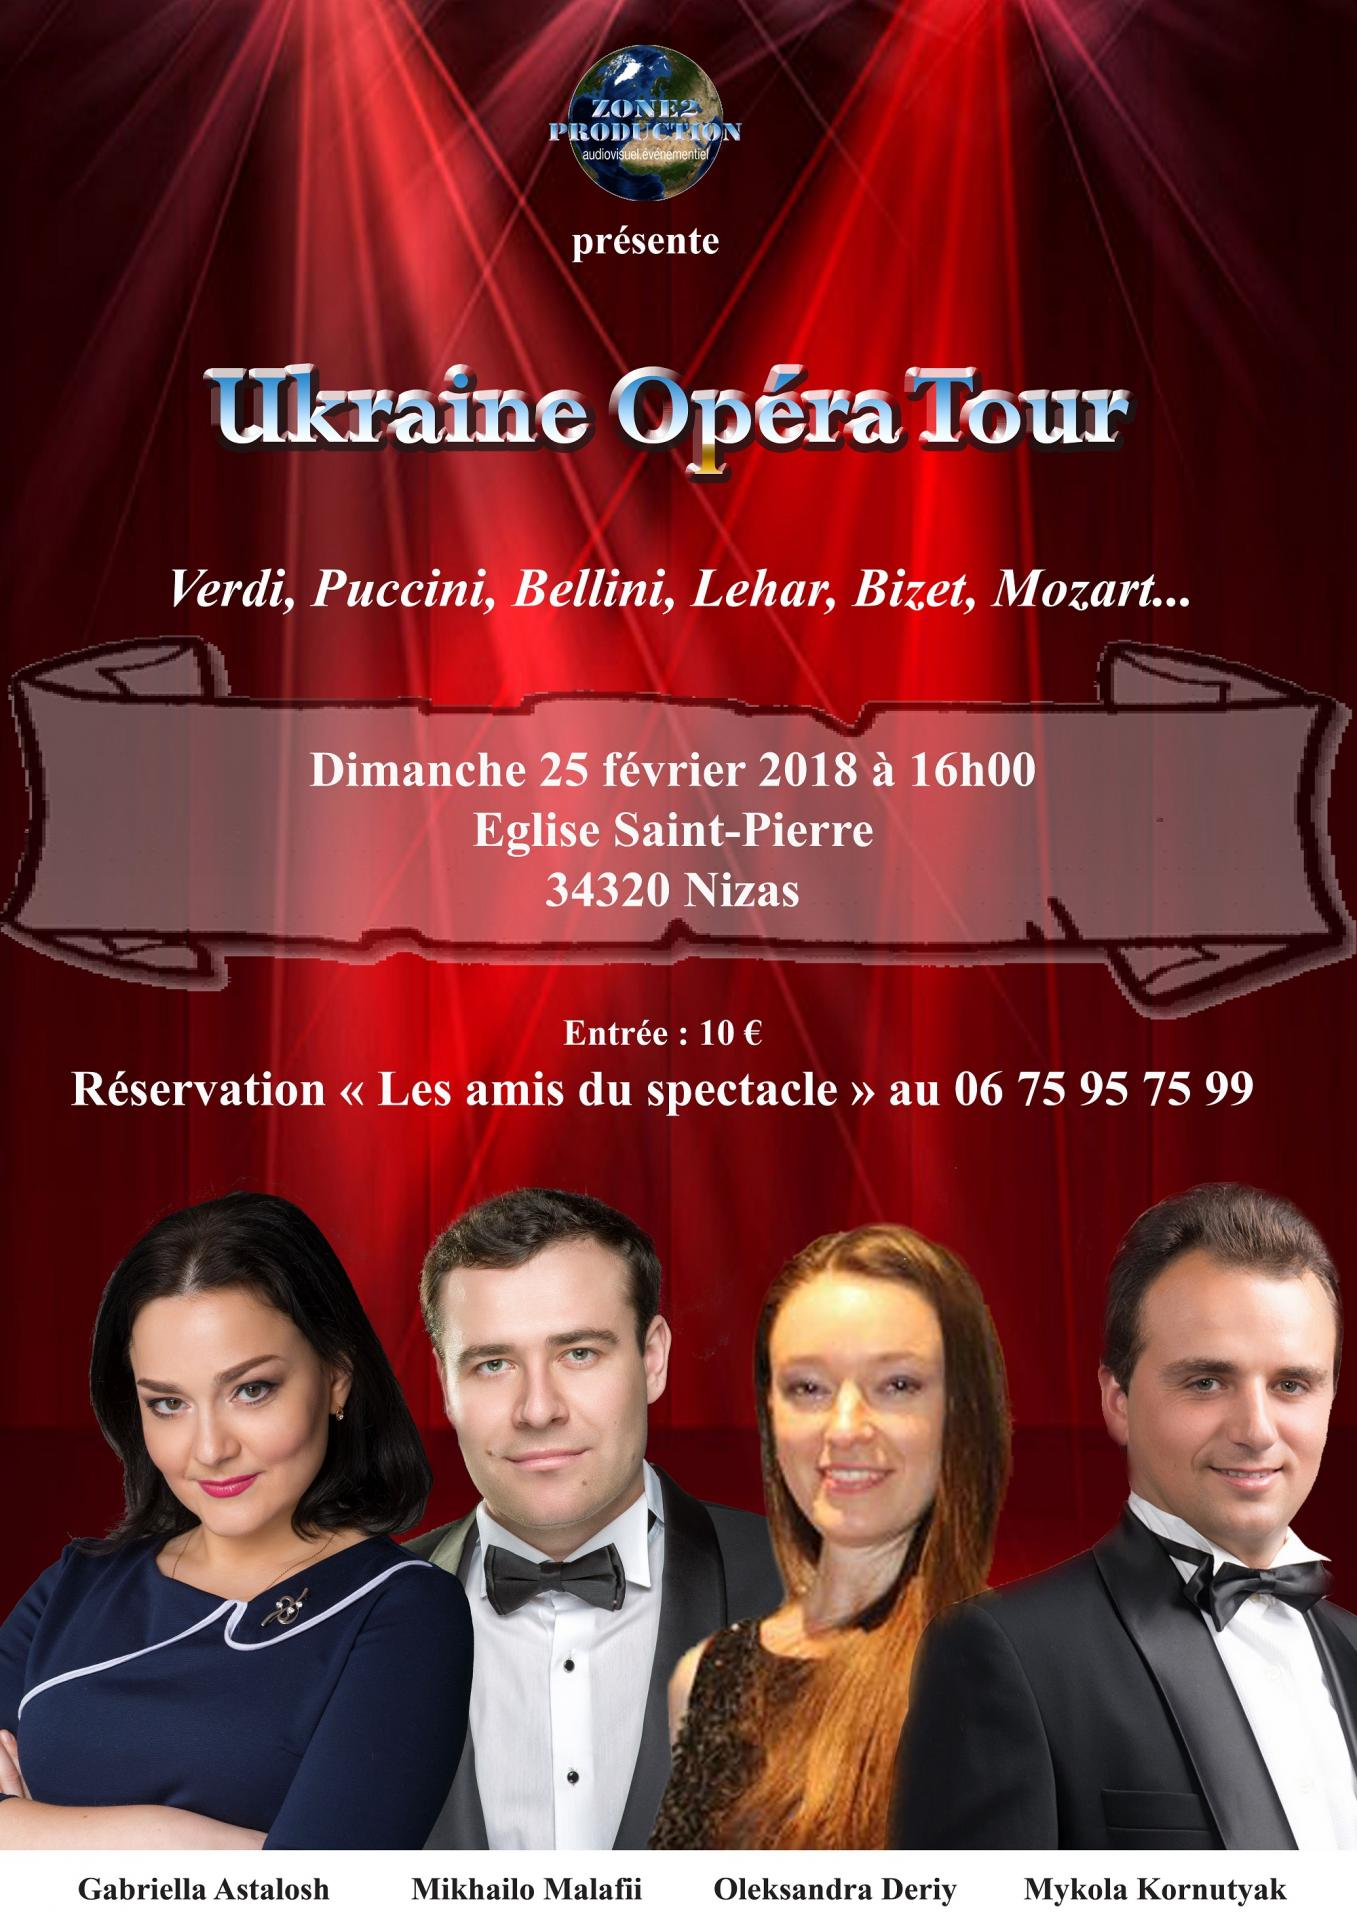 L a s ukraine opera tour rectoii